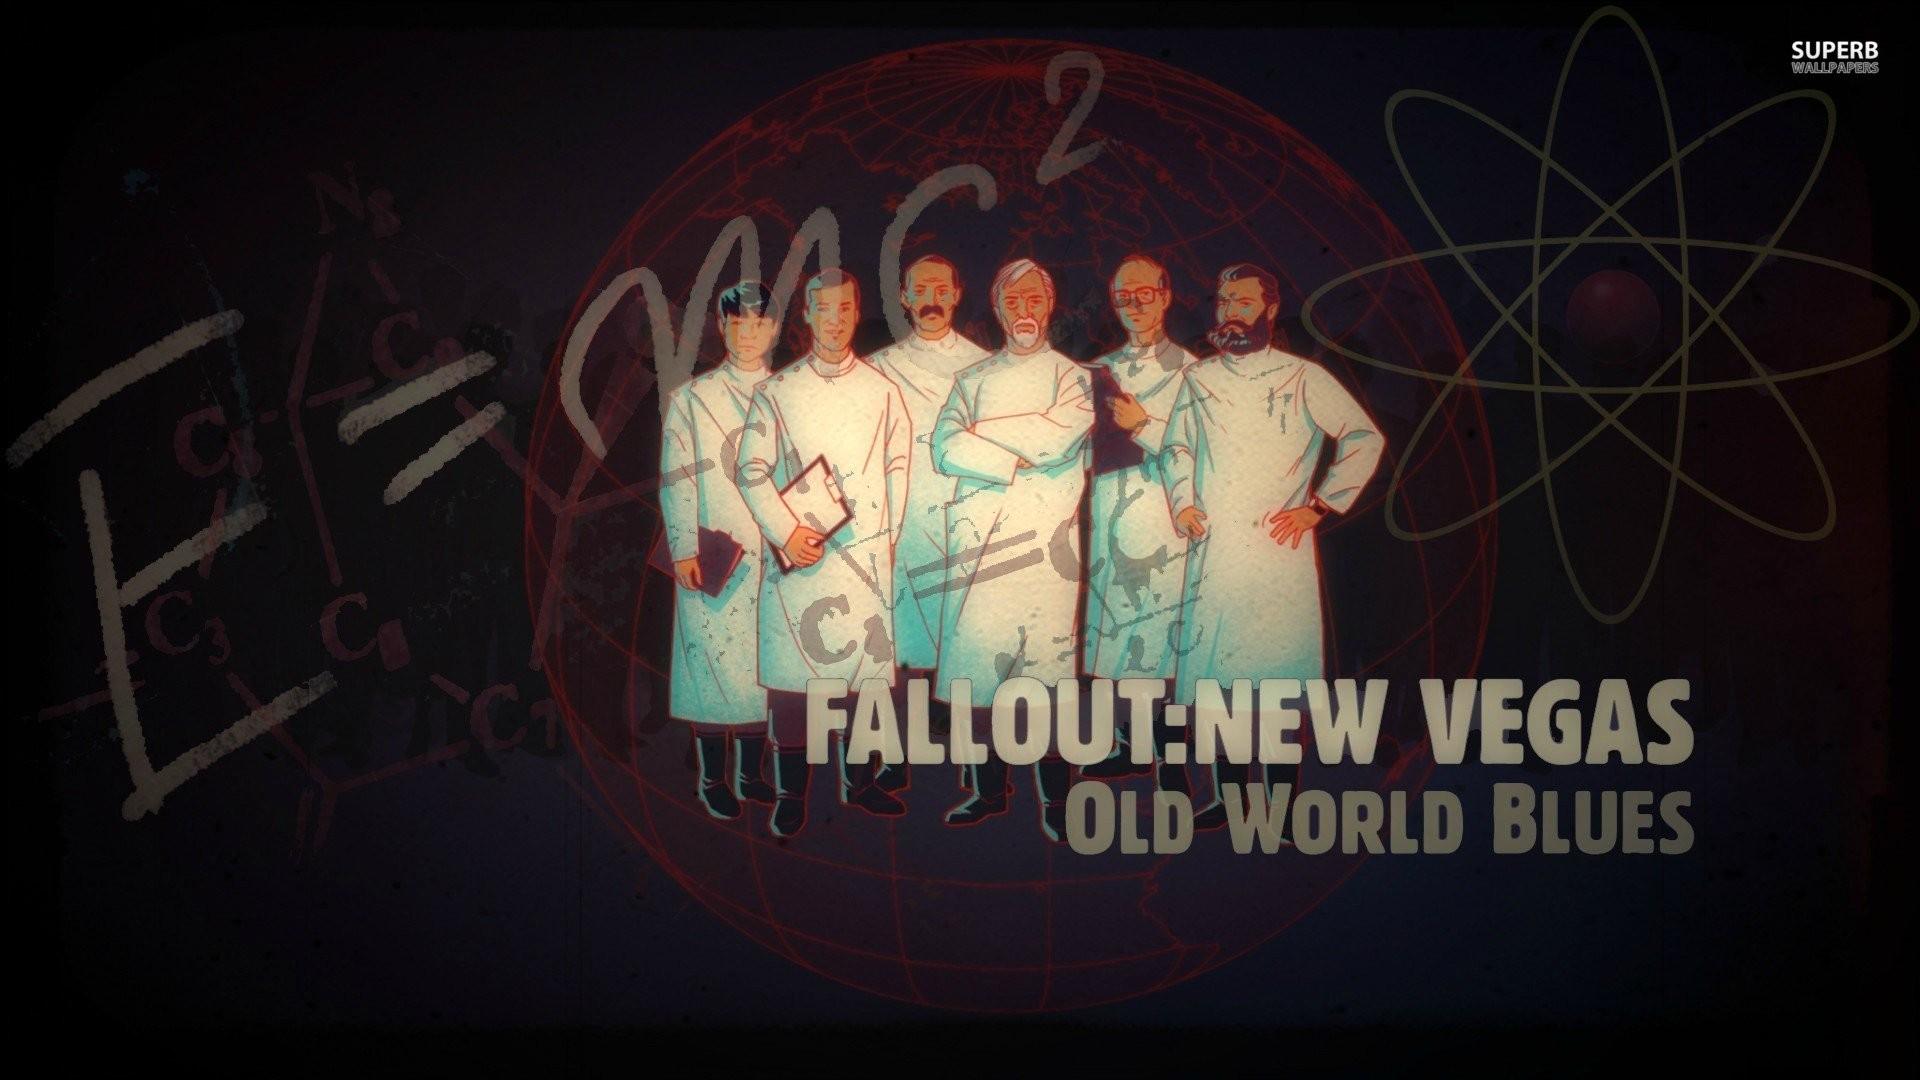 Fallout New Vegas – Old World Blues